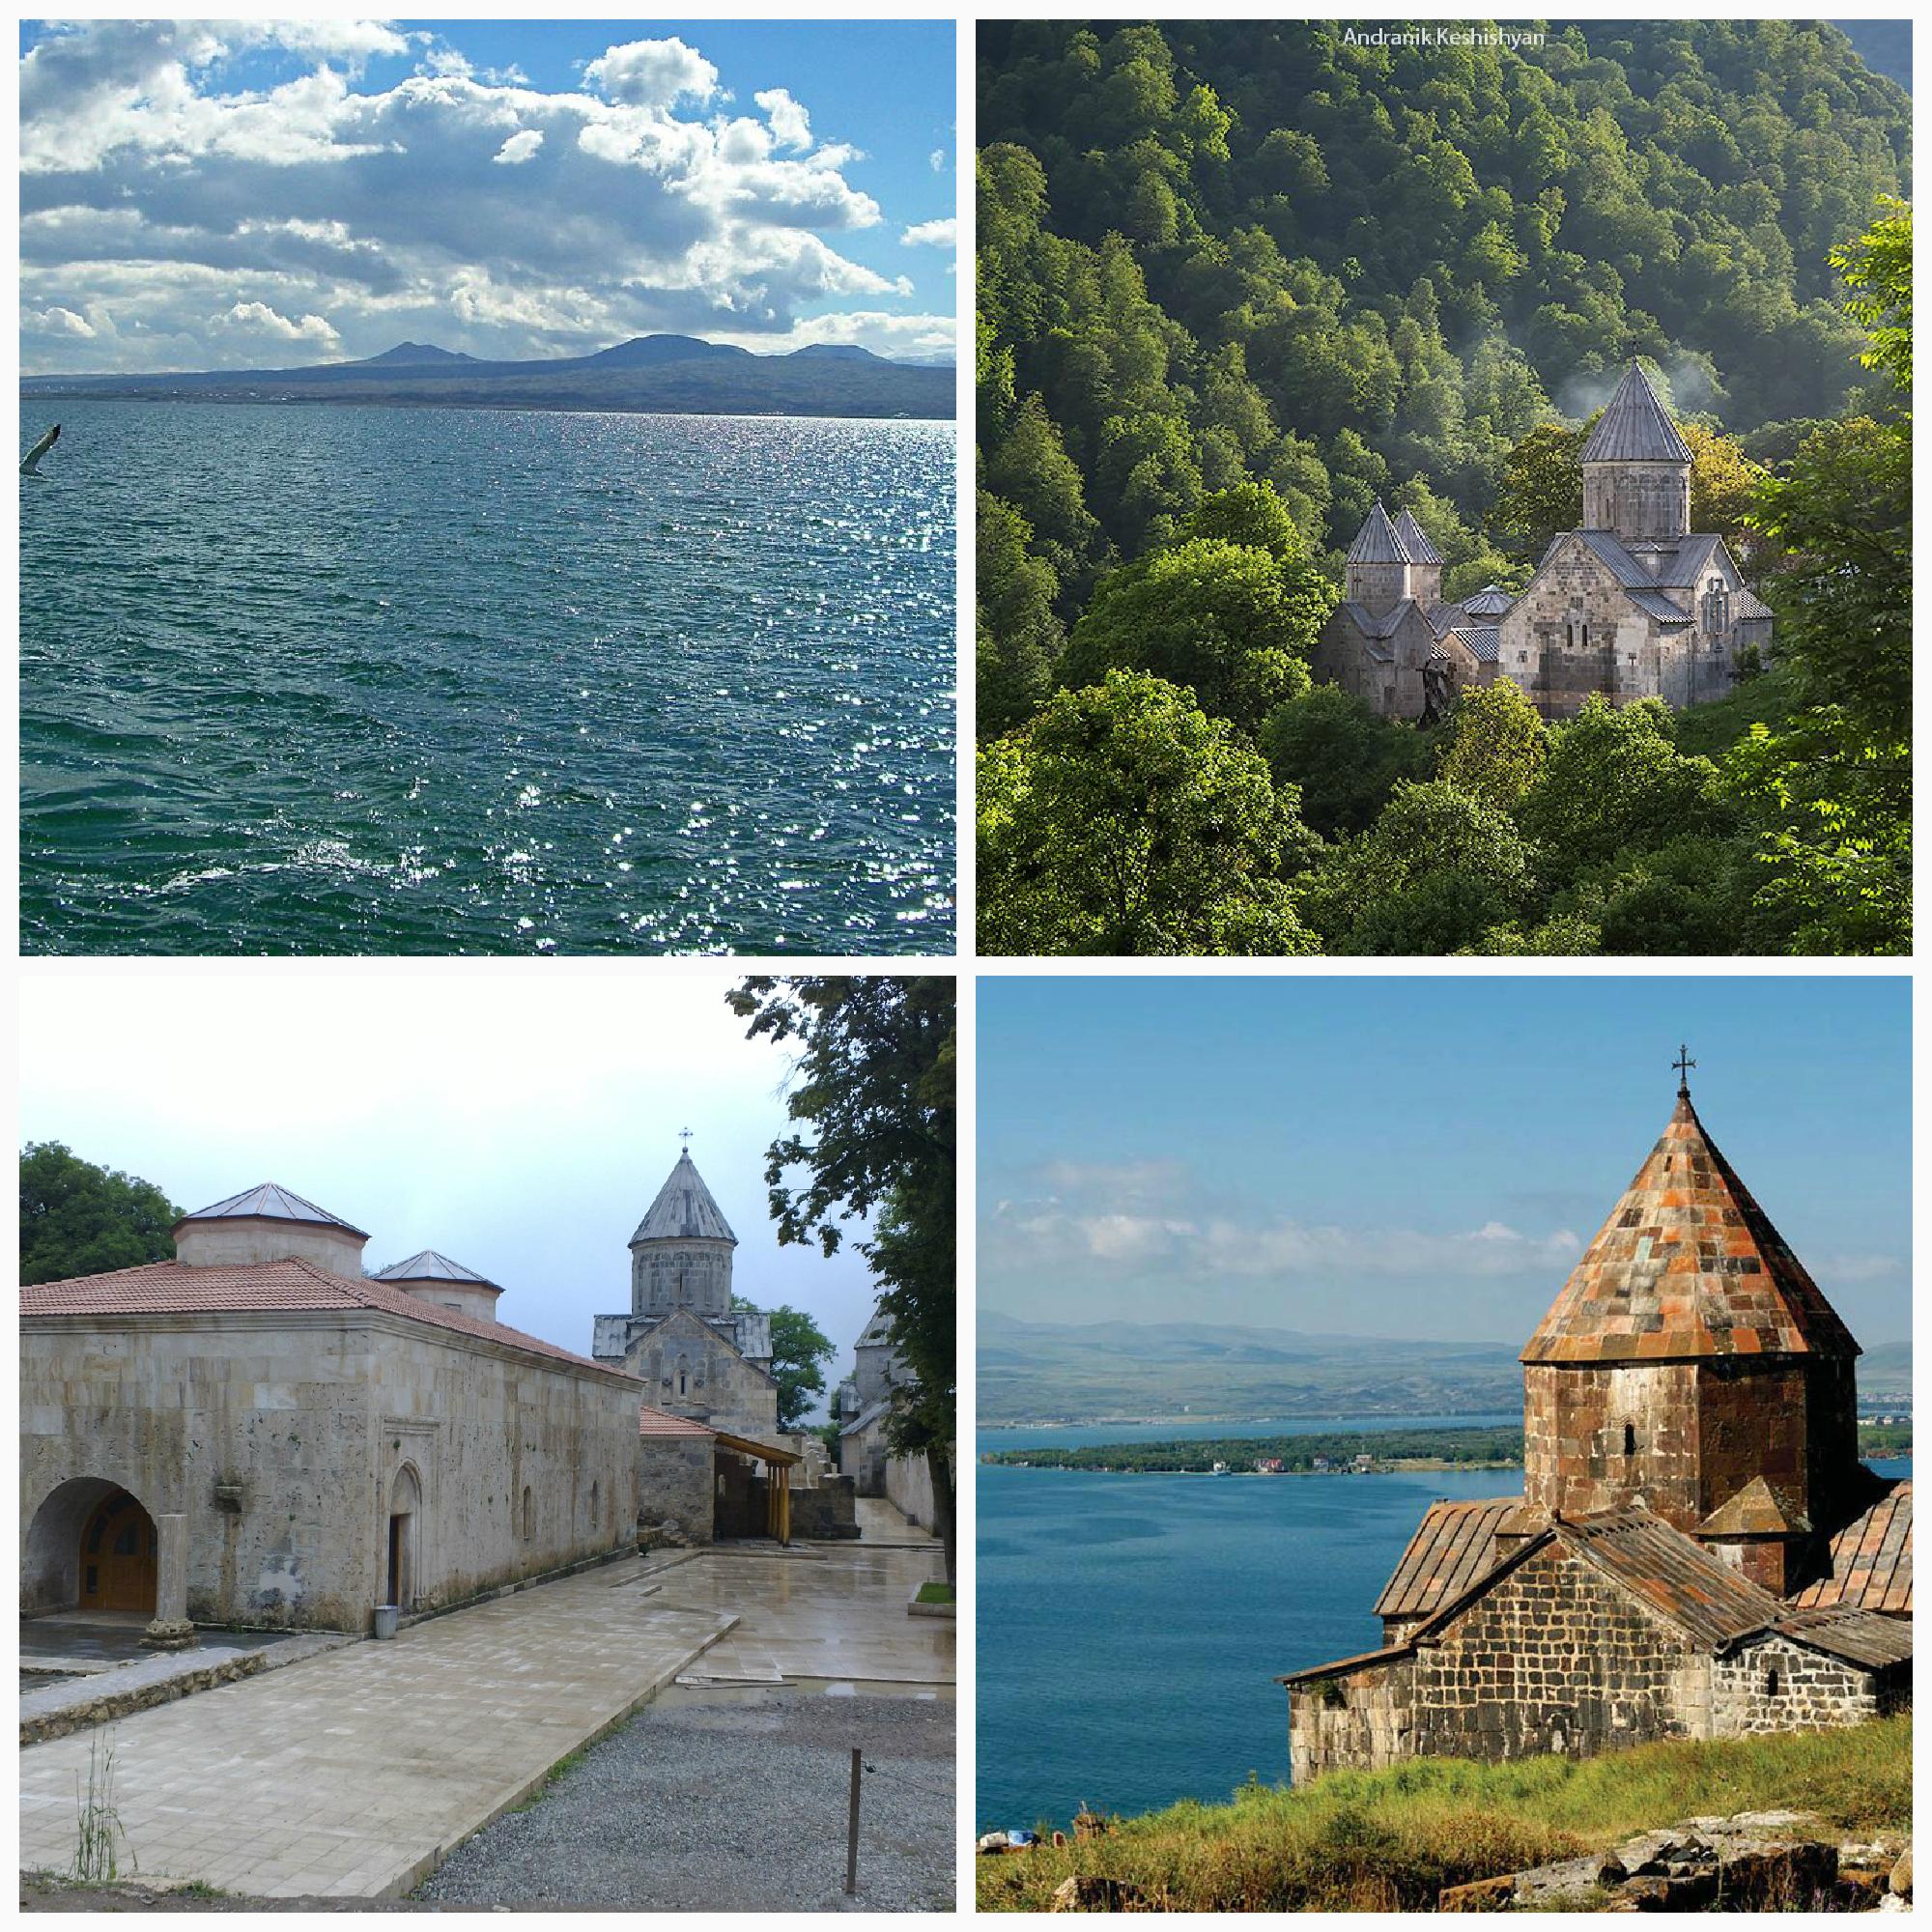 Lake Sevan: Tour To Lake Sevan And Haghartsin